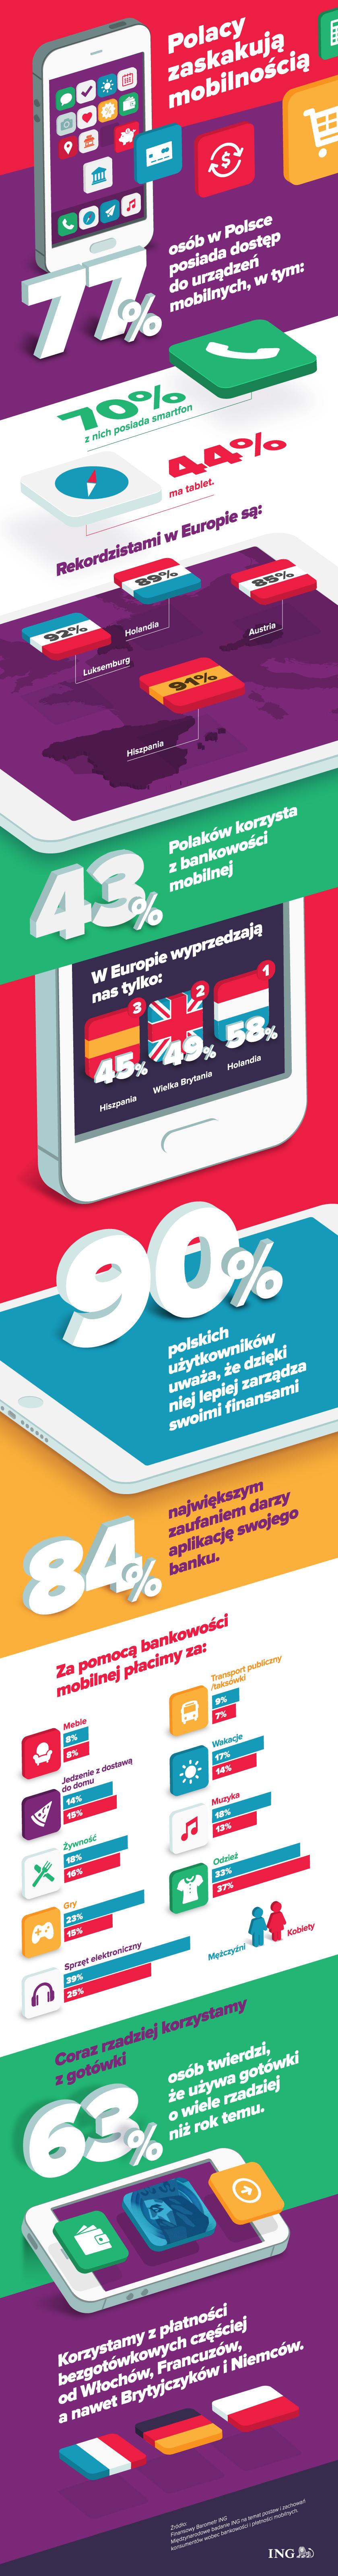 mobilni polacy.png